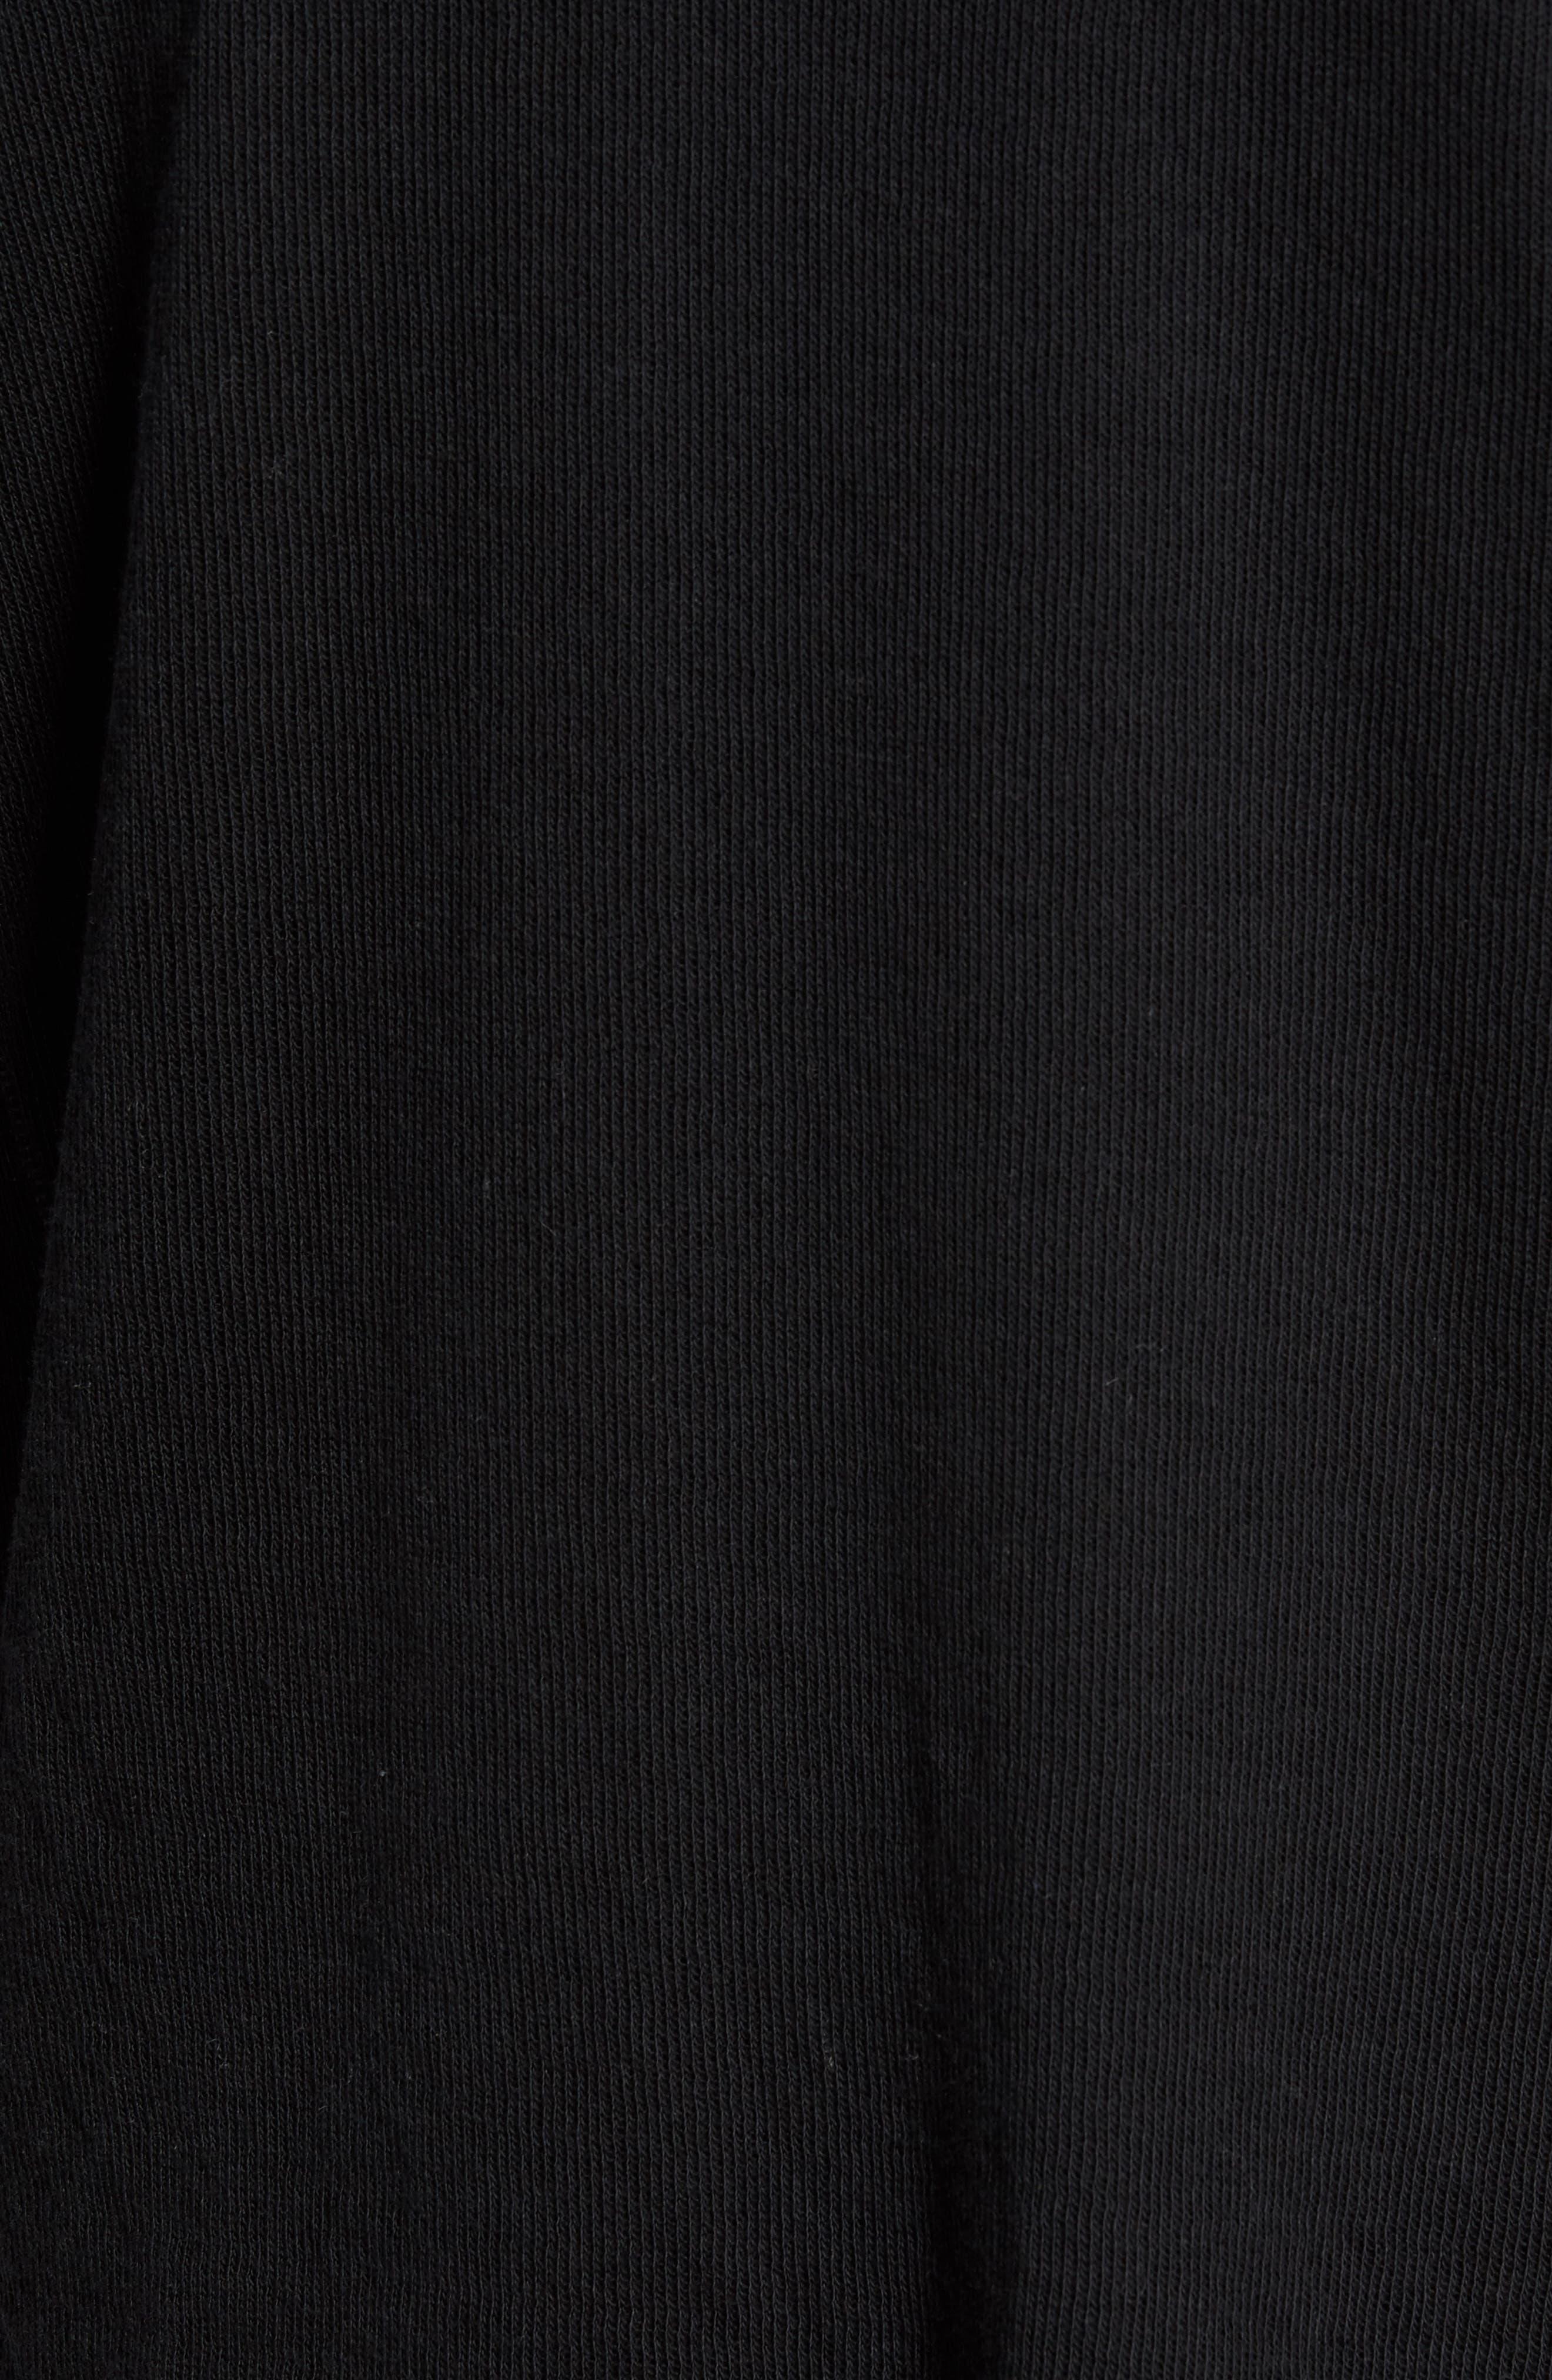 VINCE, Double Knit Long Sleeve T-Shirt, Alternate thumbnail 5, color, BLACK